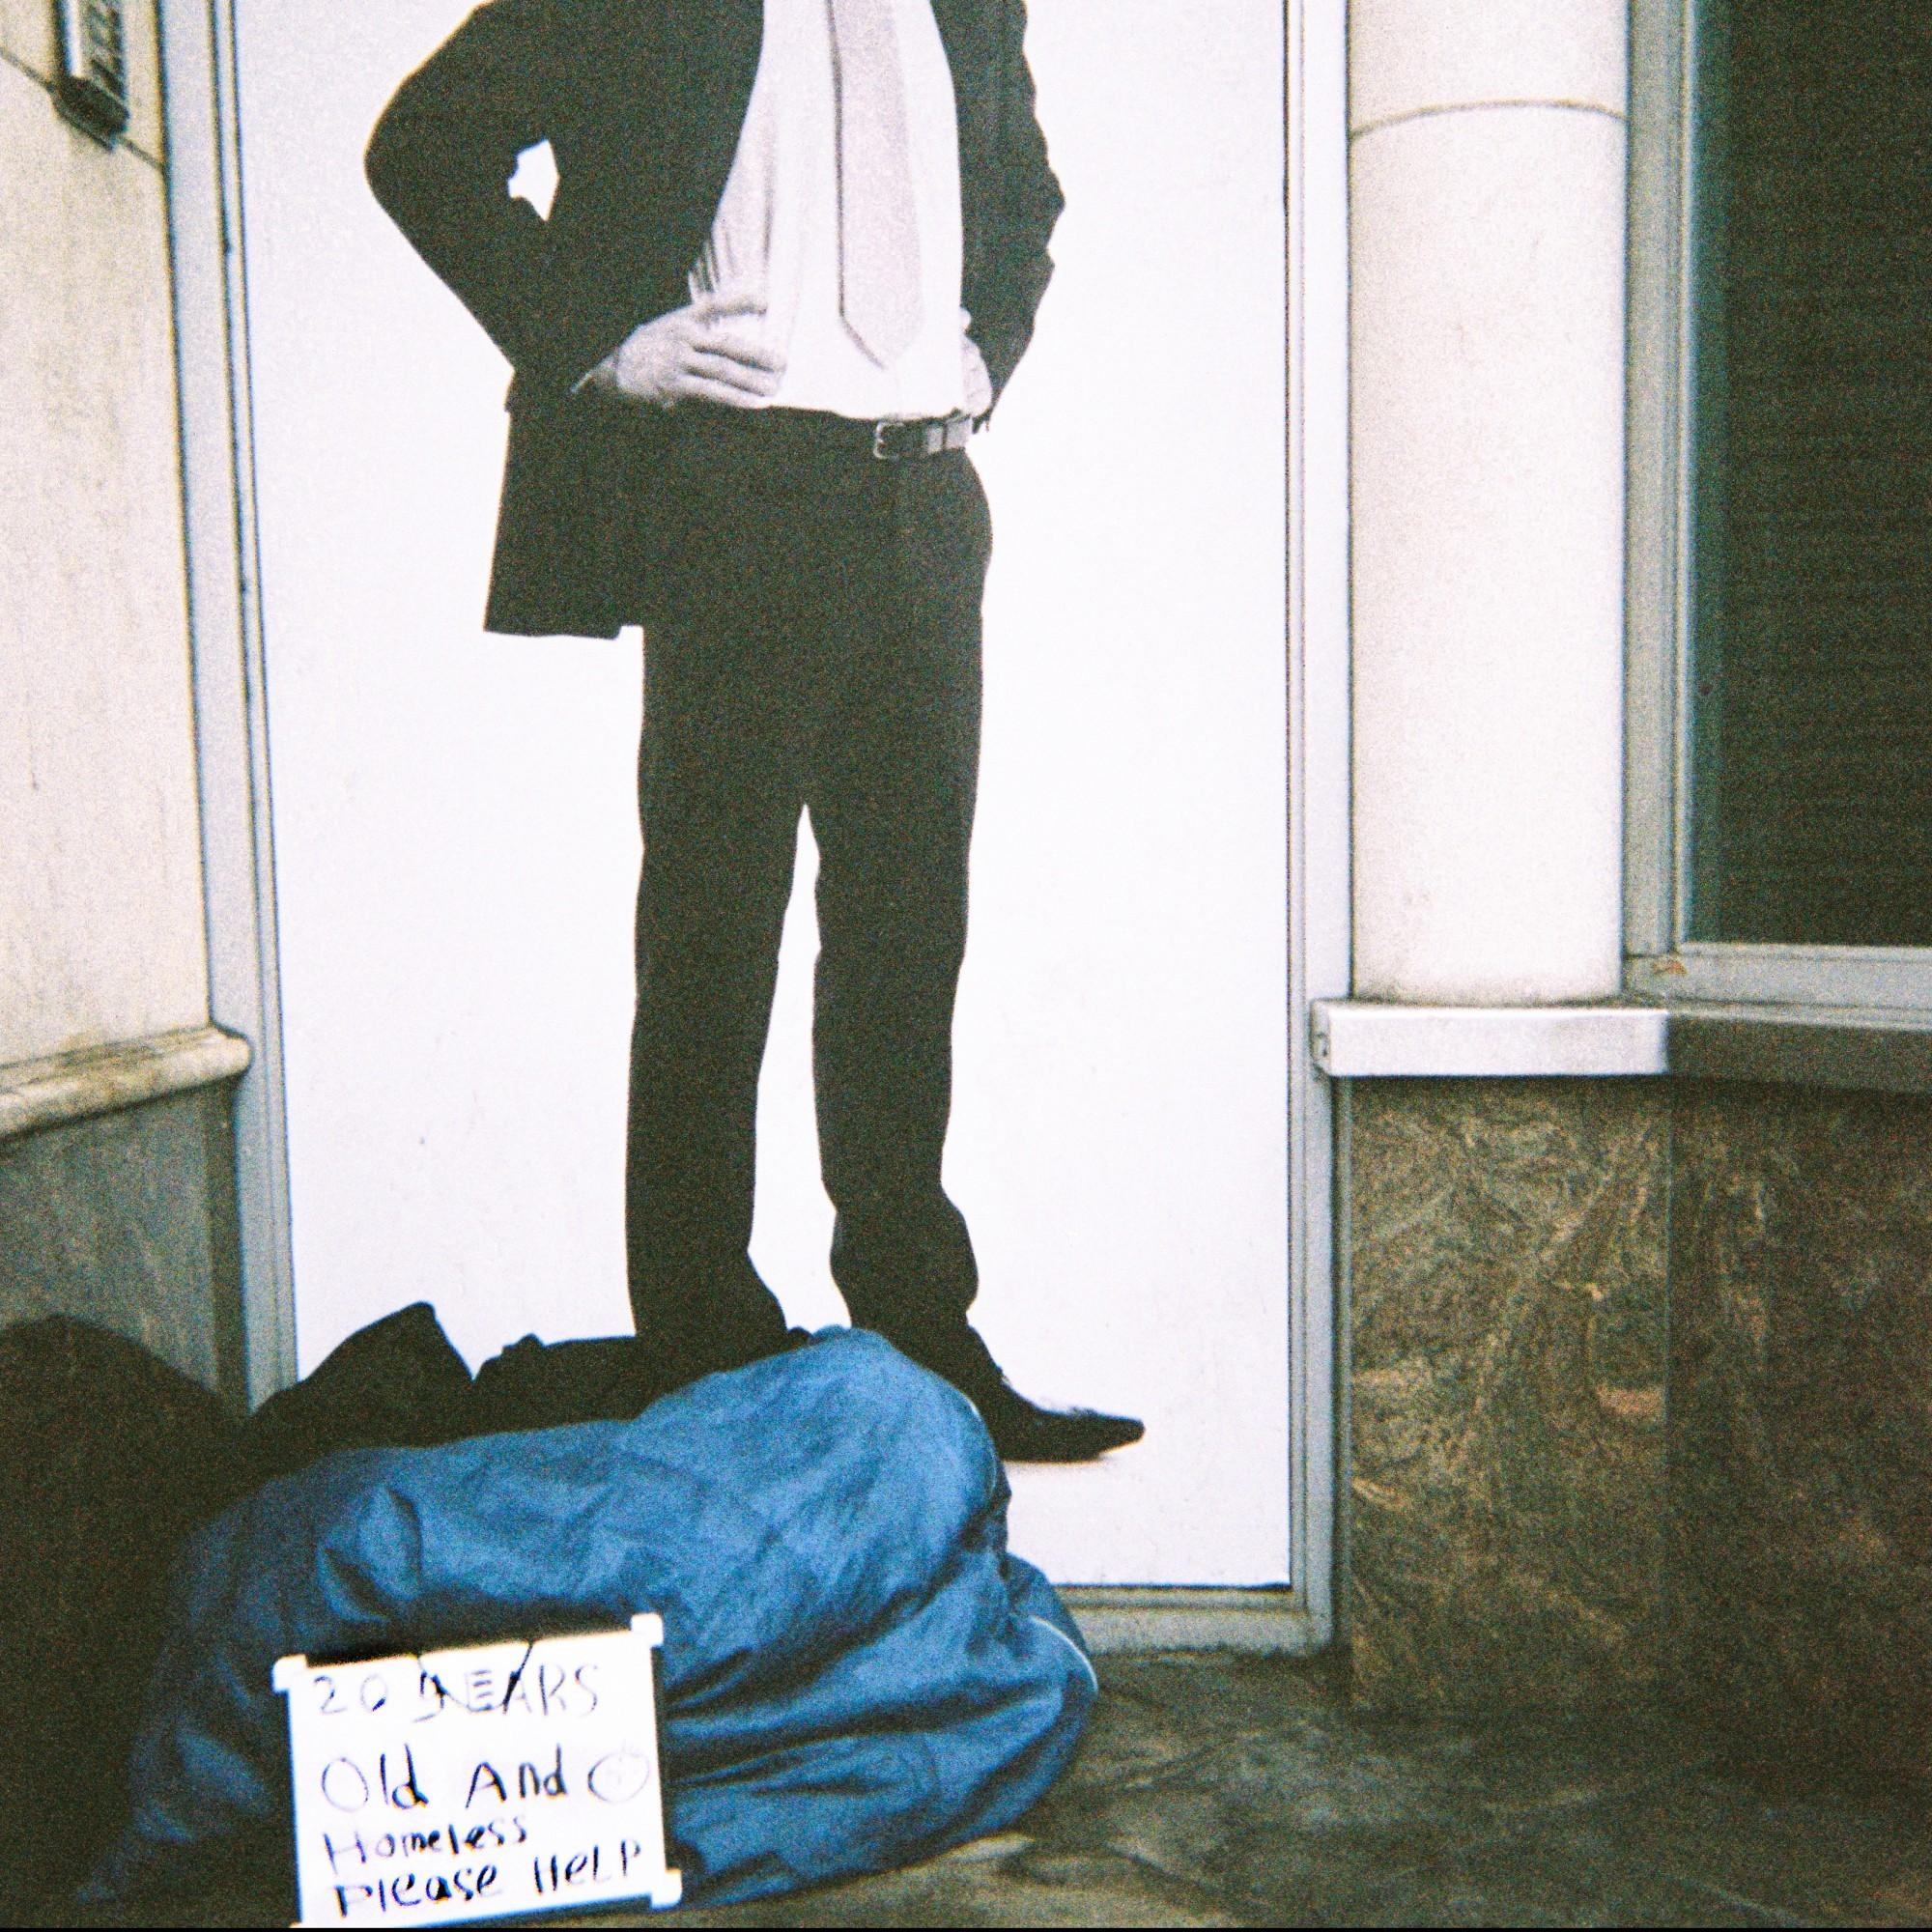 Life on the streets - how Dublin looks to a homeless photographer